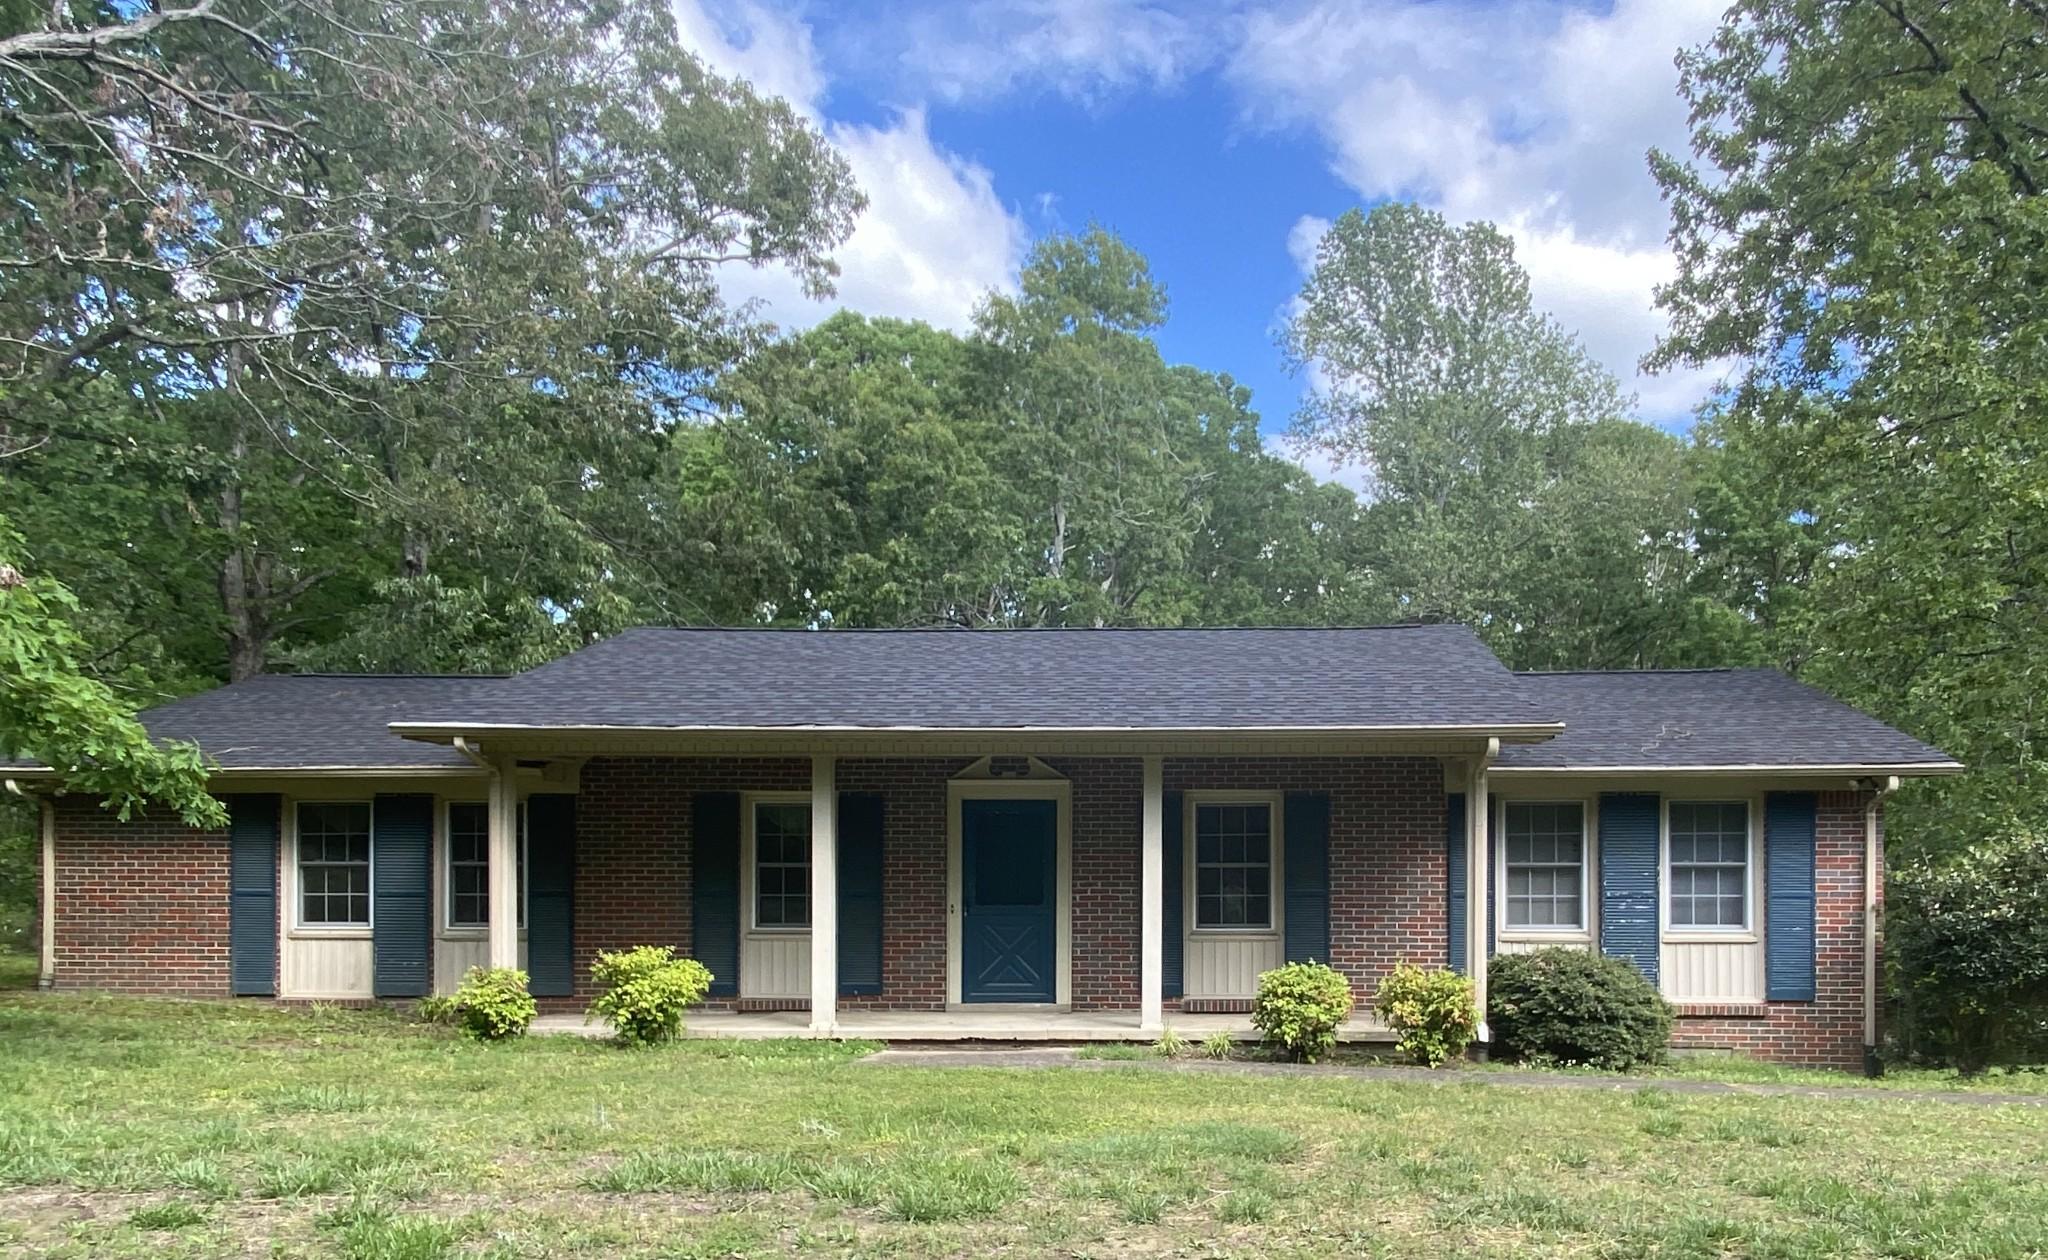 106 Dogwood Cir, Waverly, TN 37185 - Waverly, TN real estate listing